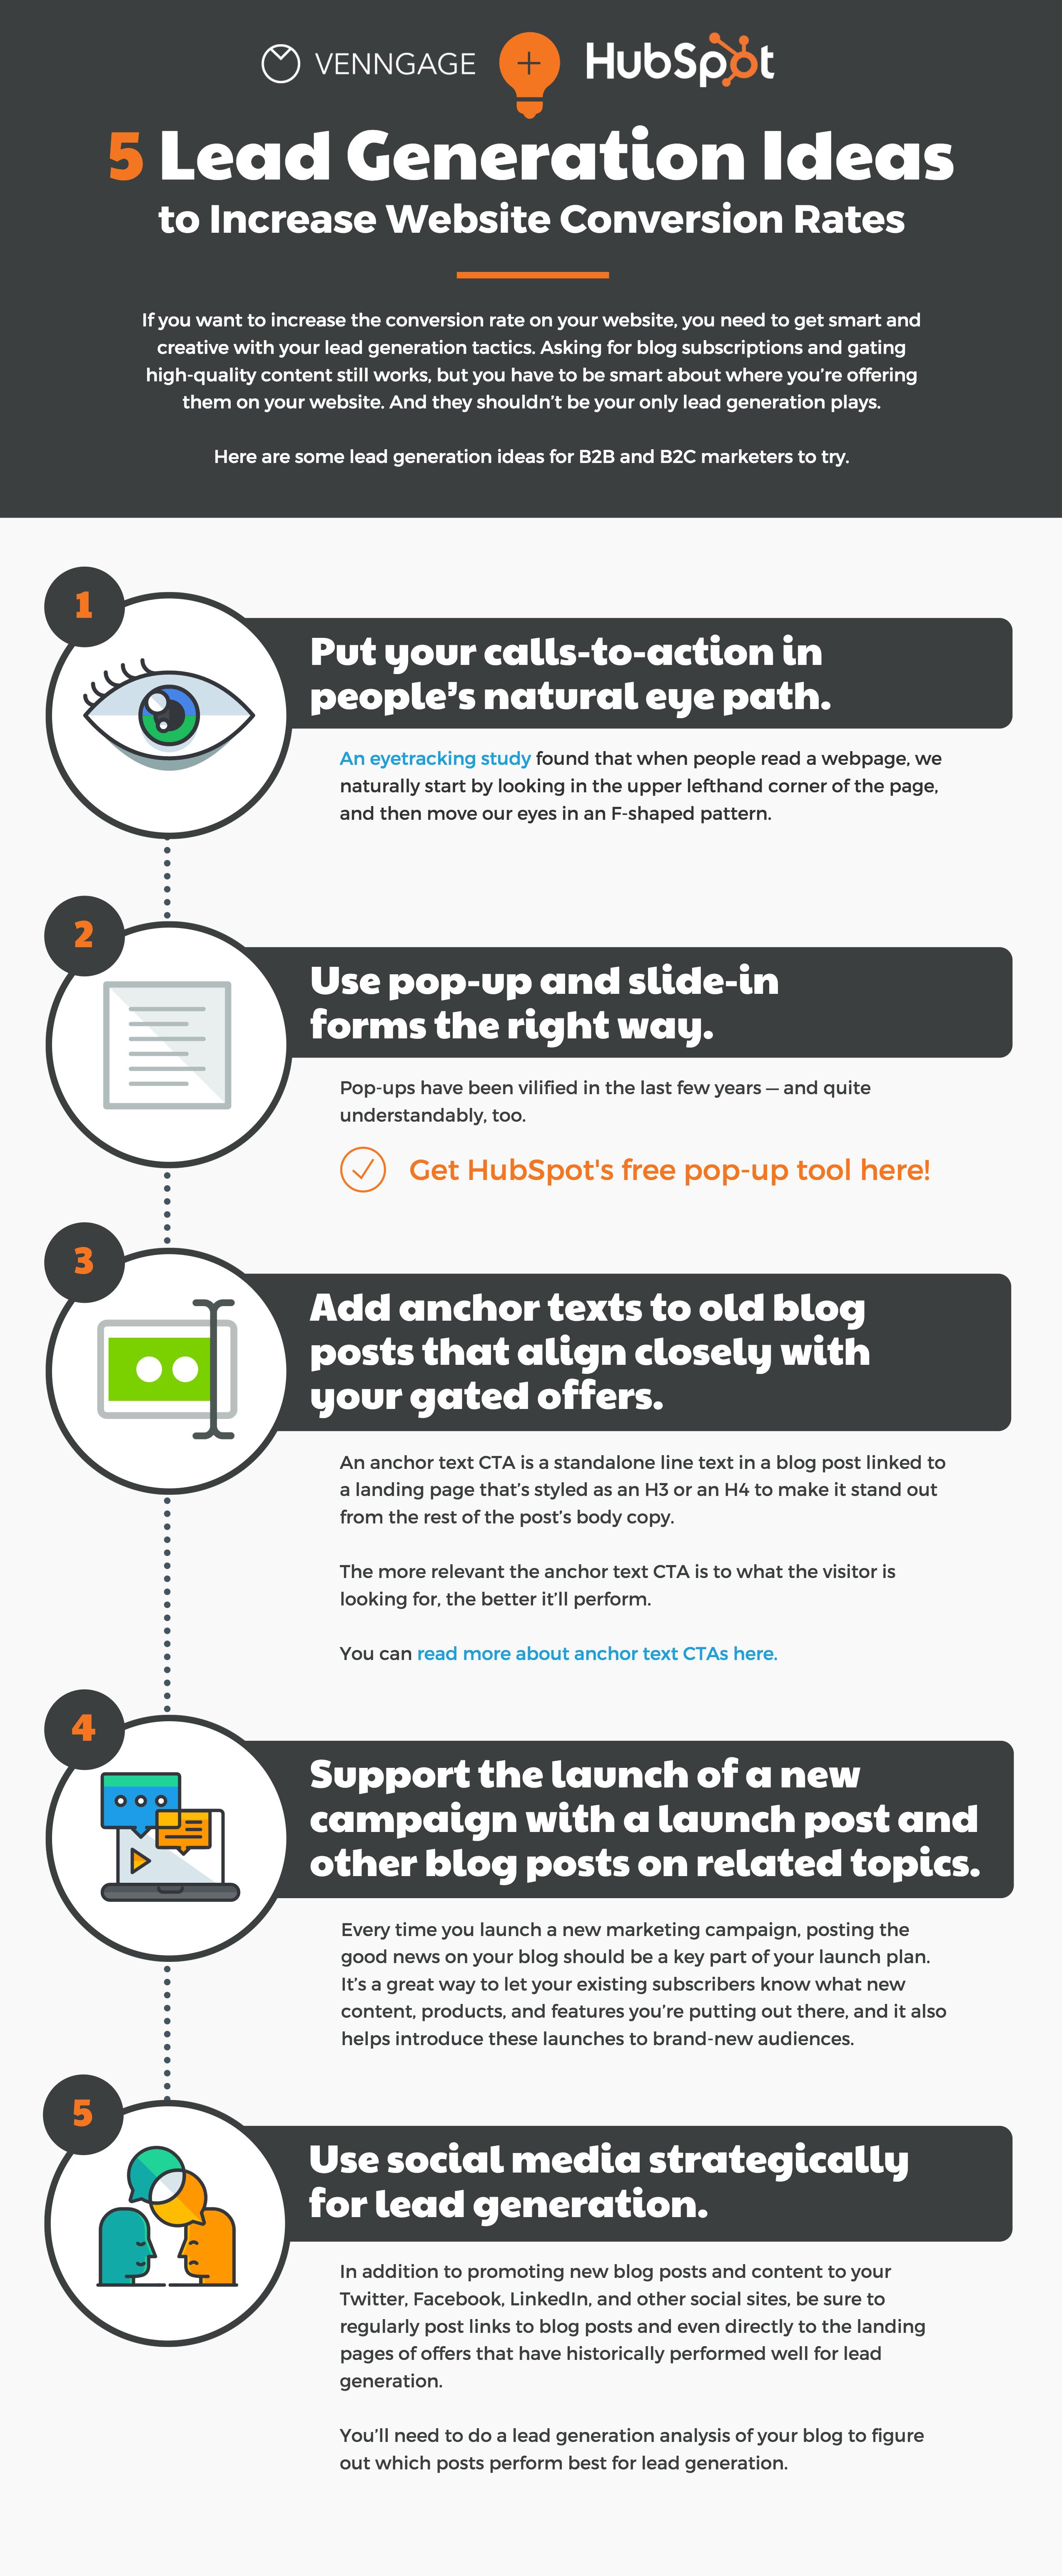 hubspot infographic template - Onwe.bioinnovate.co